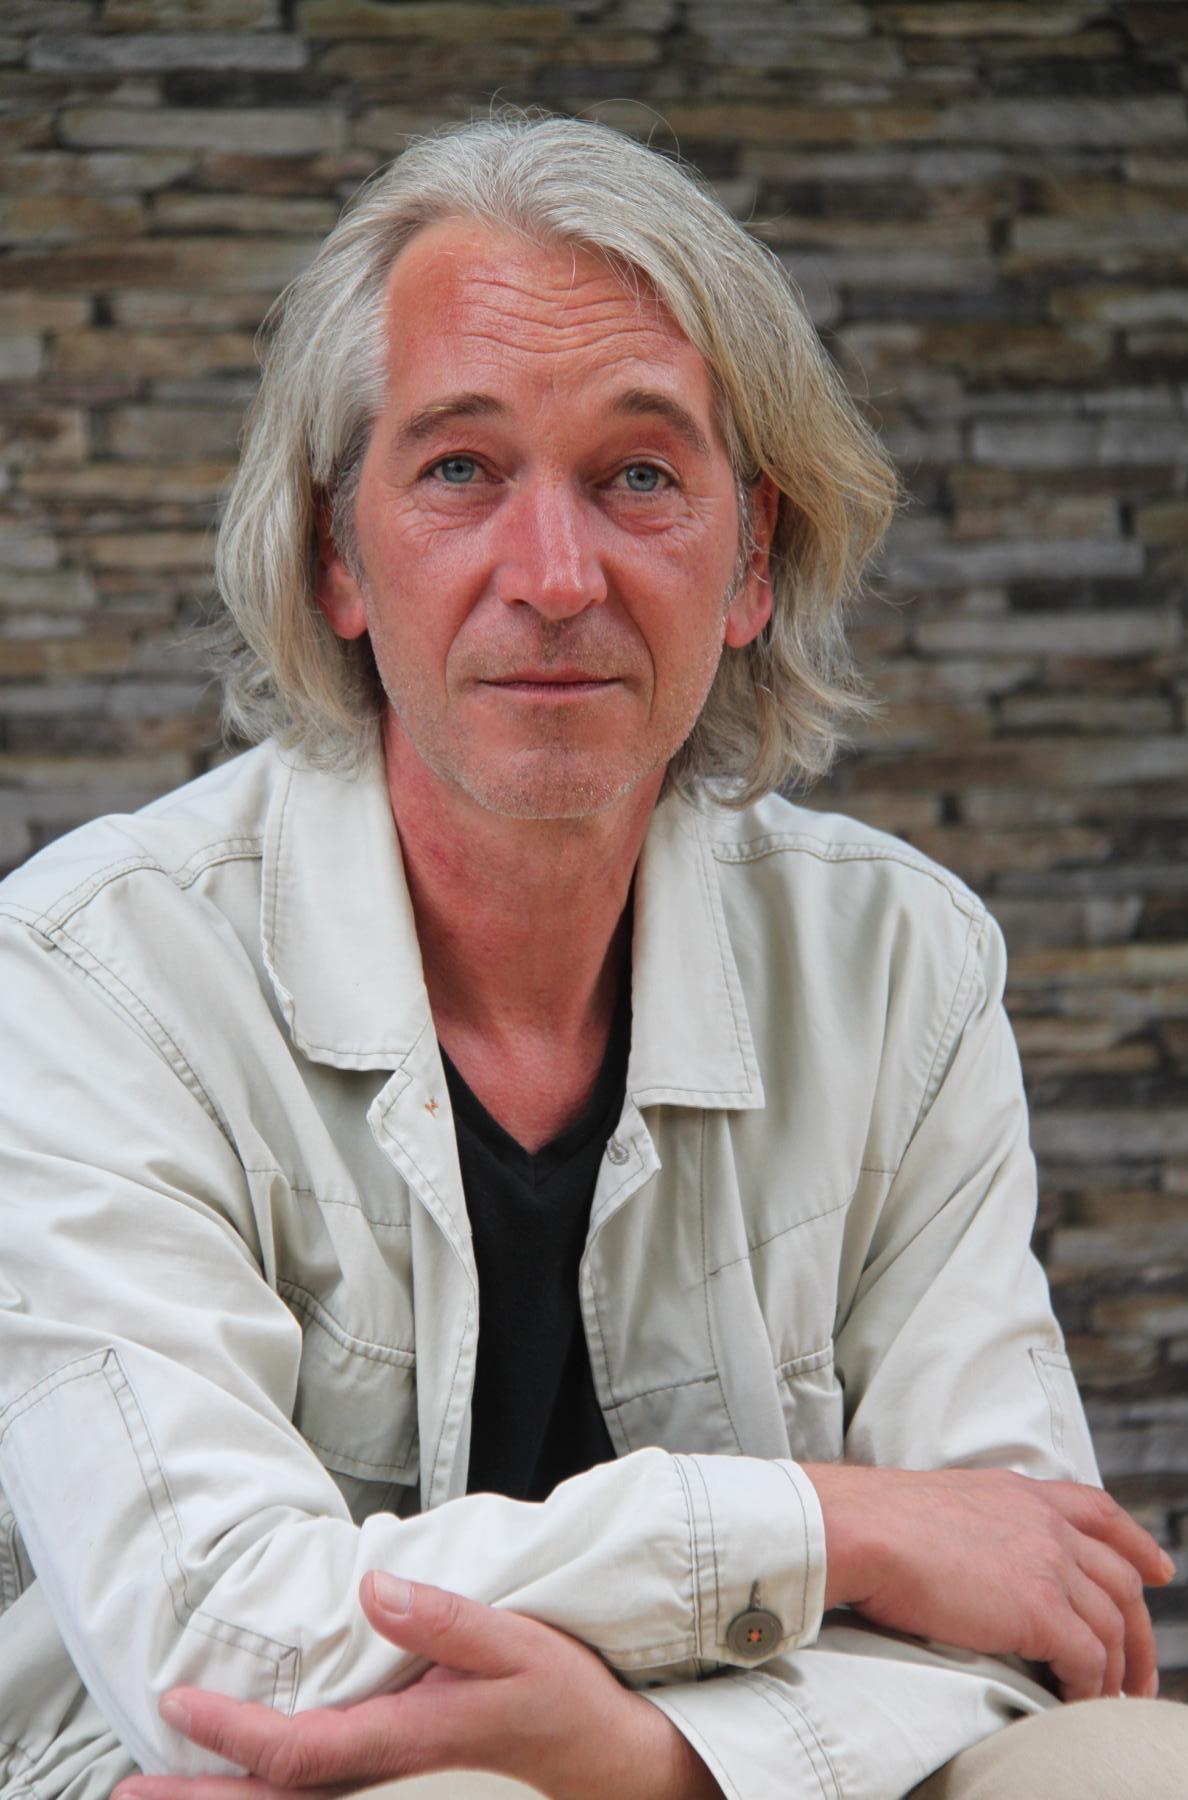 Johannes Gruber